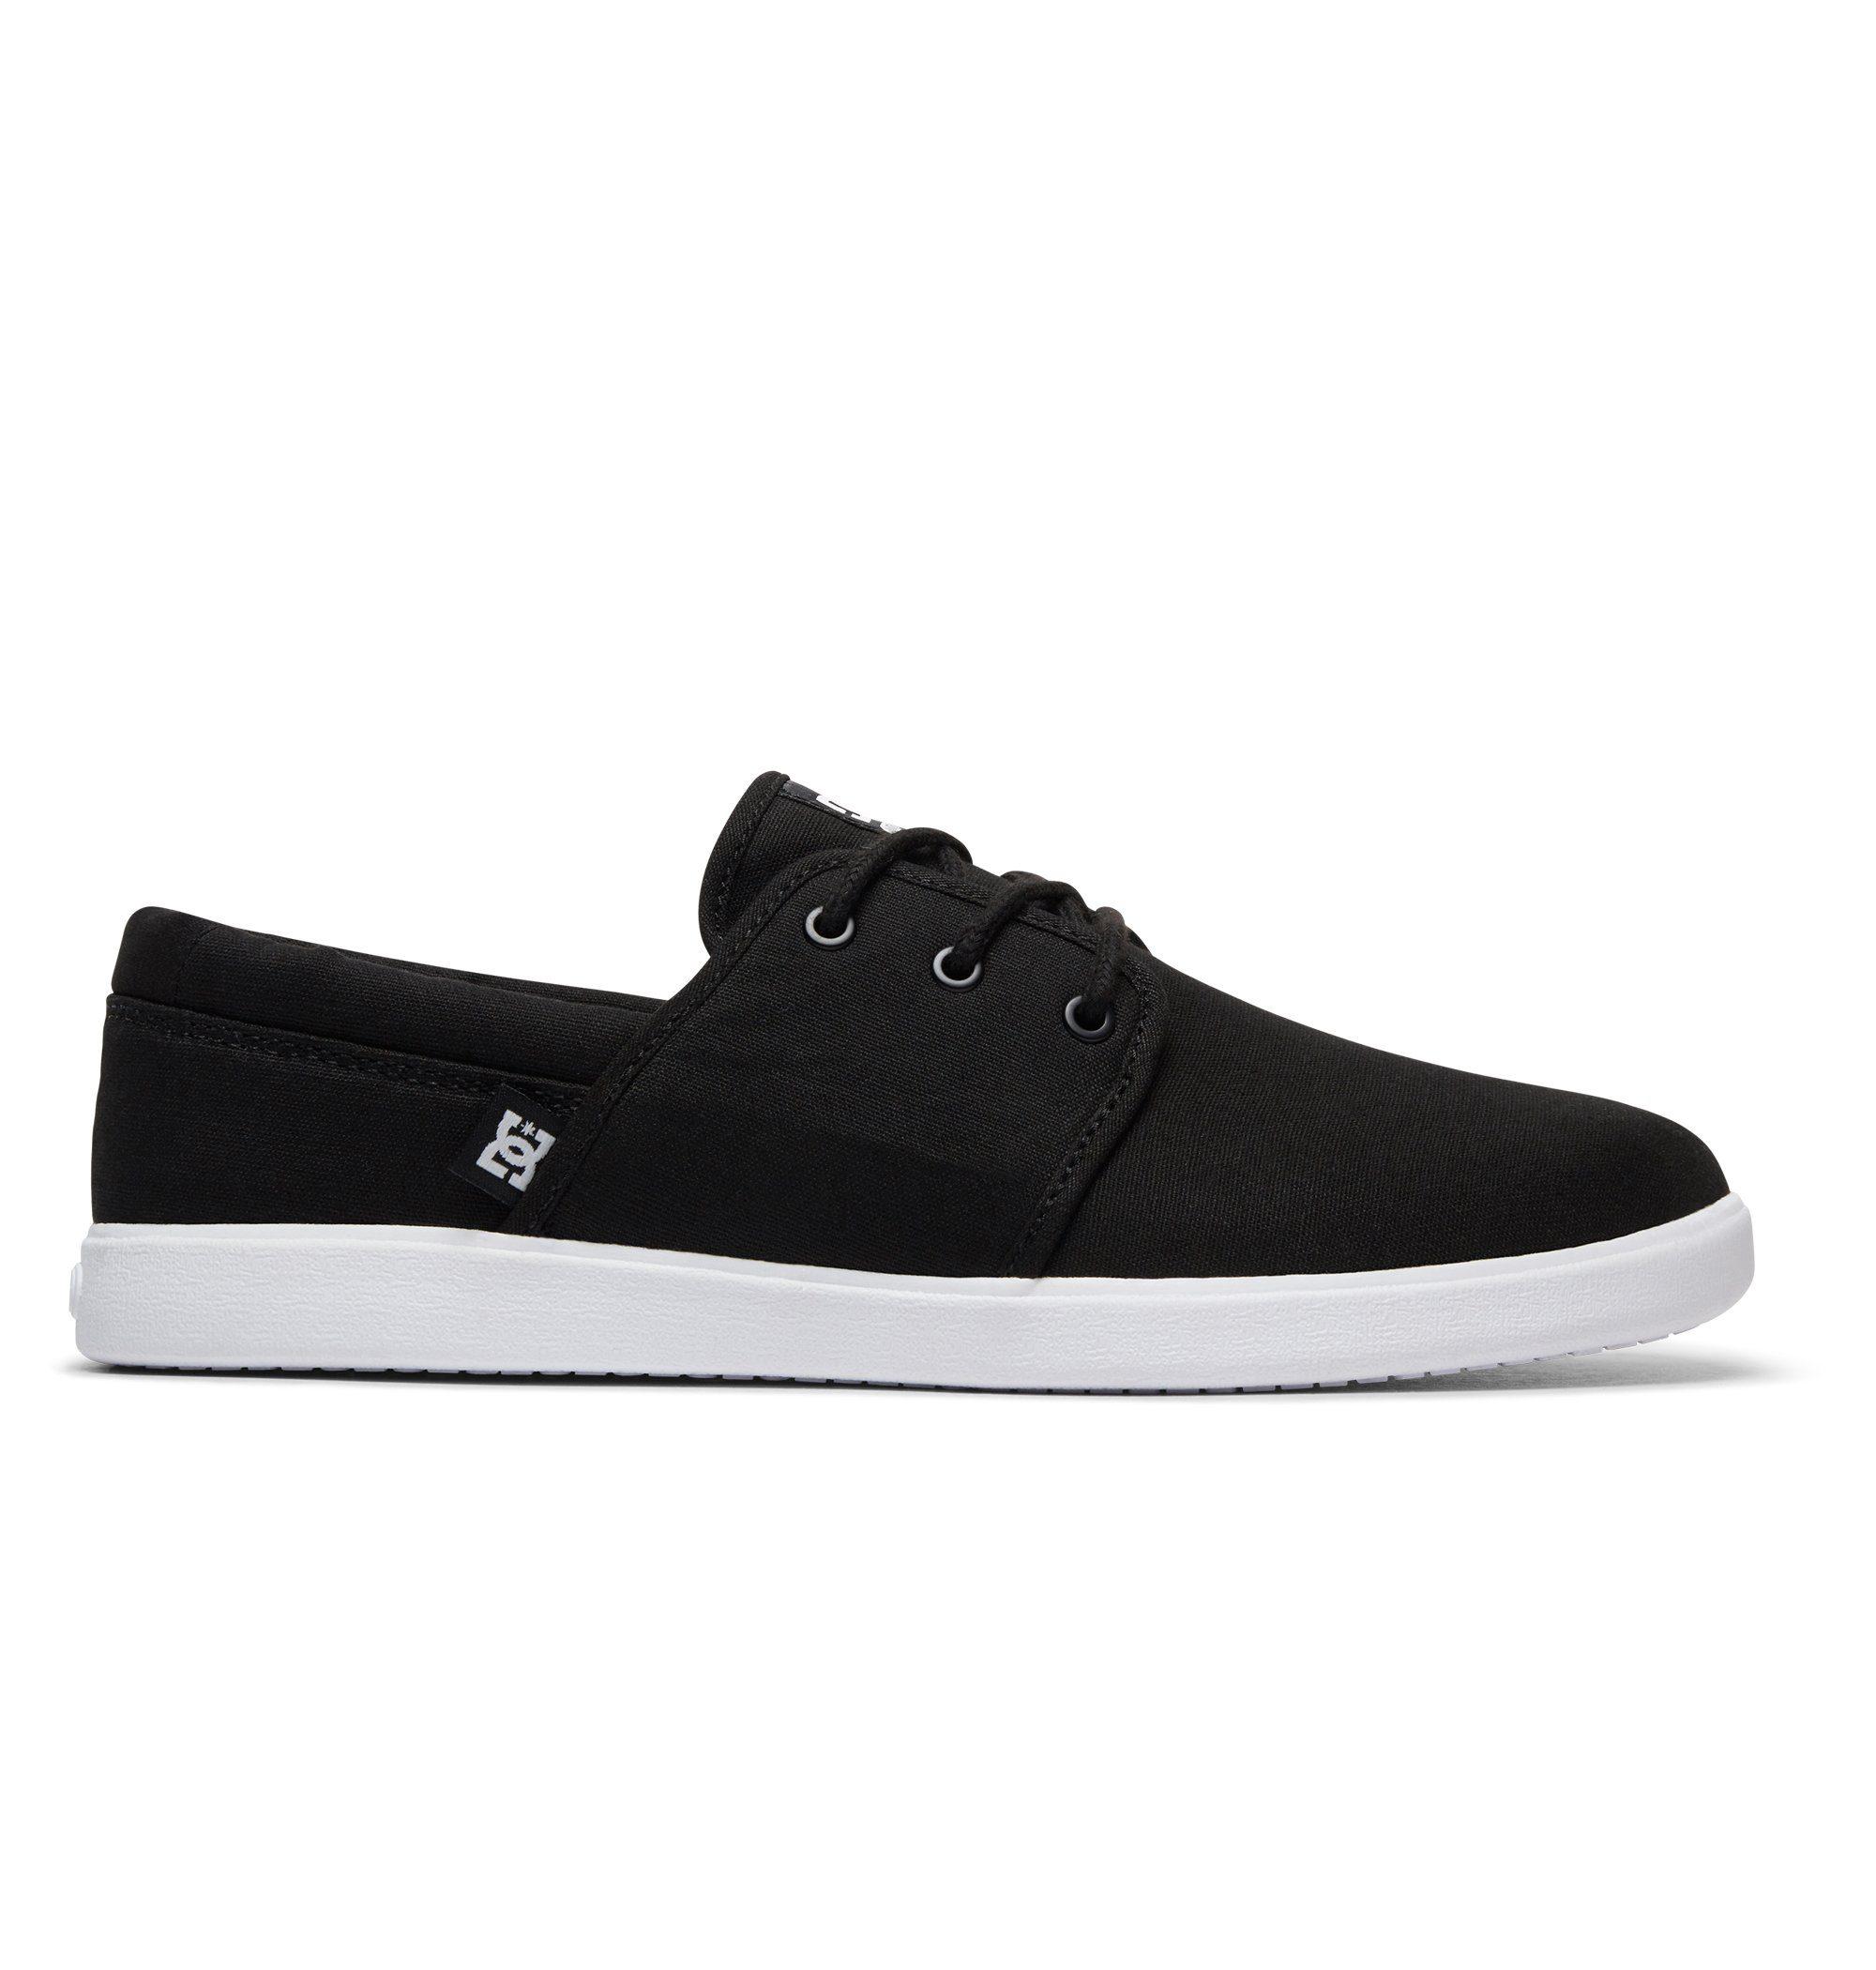 DC Shoes Schuhe Haven online kaufen  Black#ft5_slash#black#ft5_slash#white